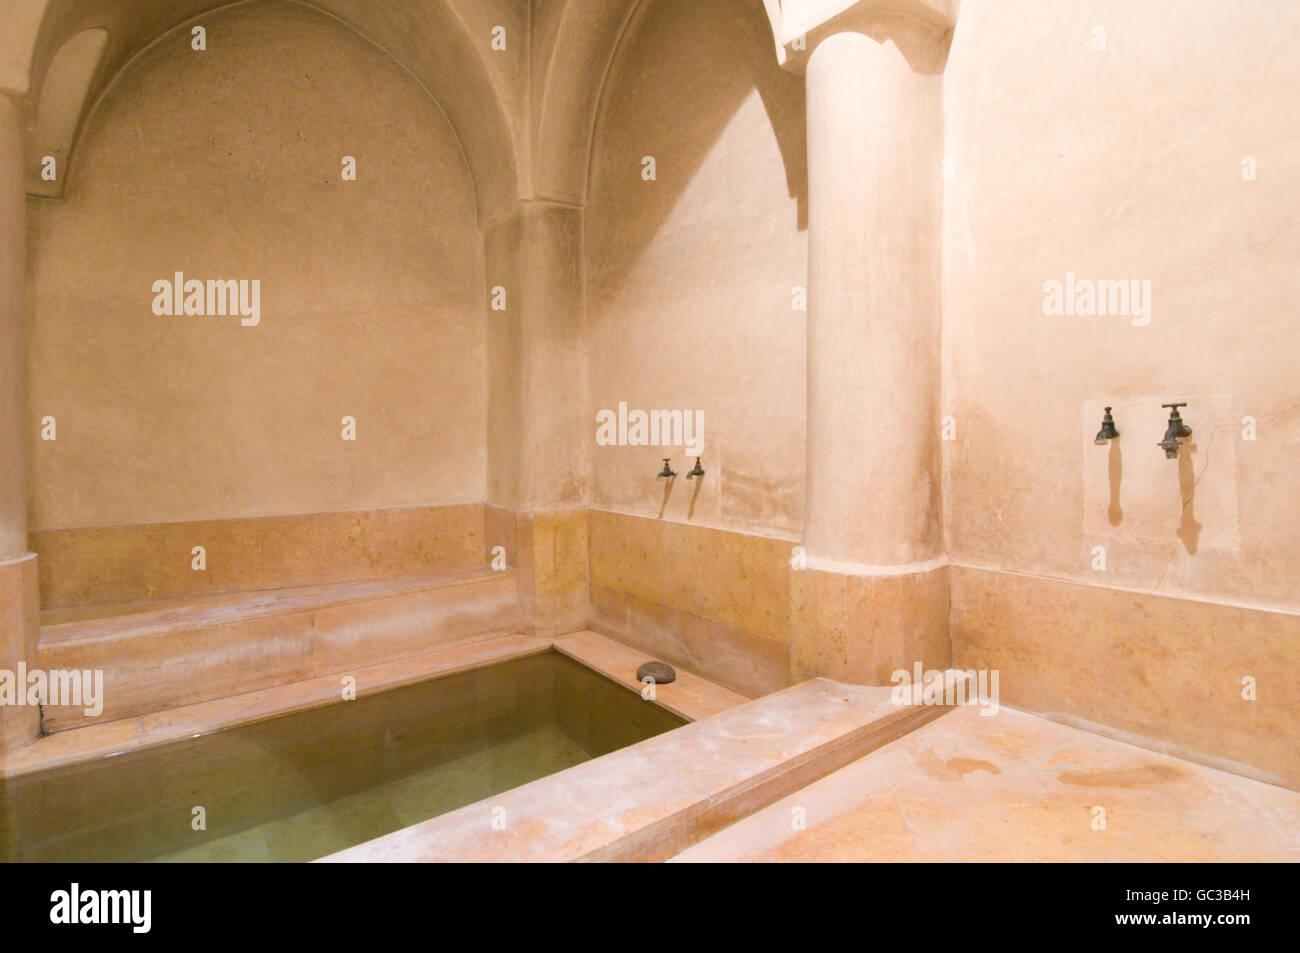 Salle De Bain Style Riad ~ riad caravanserai salle de bains avec murs en pl tre marocain